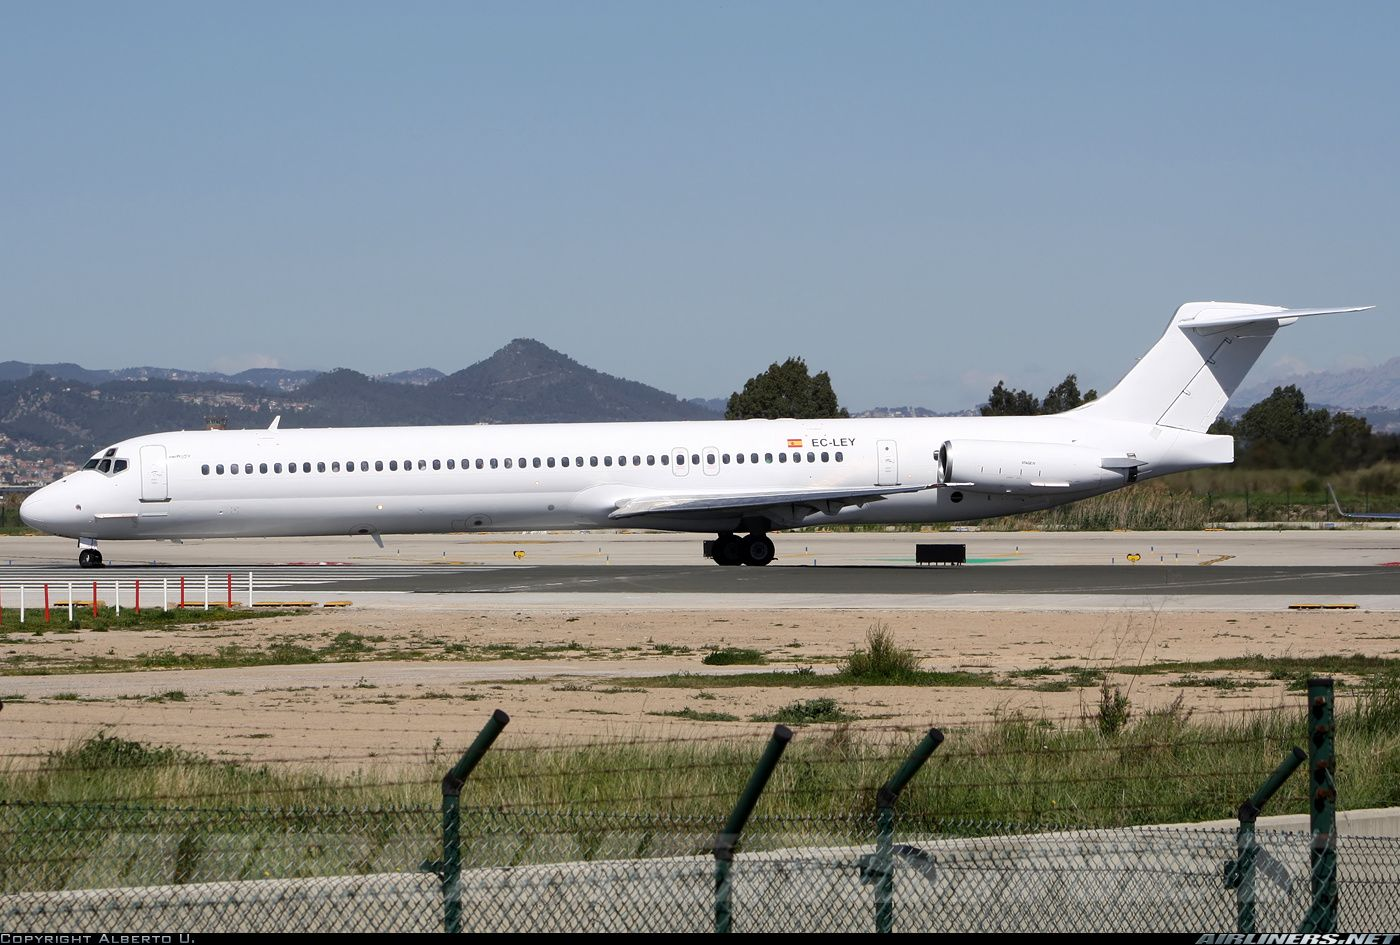 McDonnell Douglas MD83 (DC983) aircraft picture